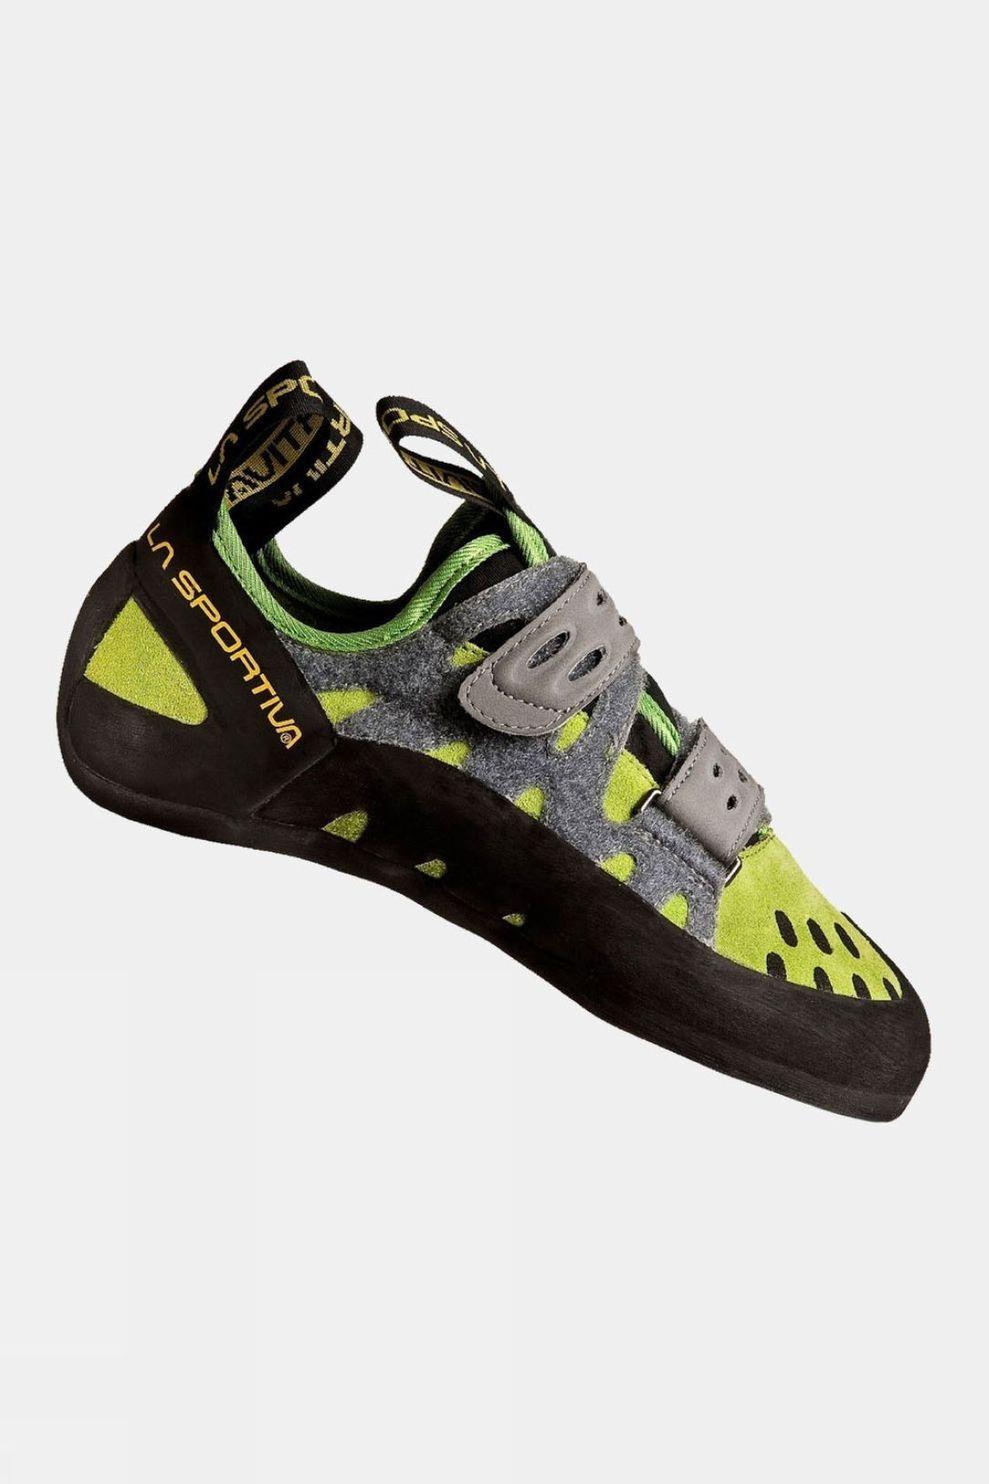 La Sportiva Mens Tarantula Climbing Shoe